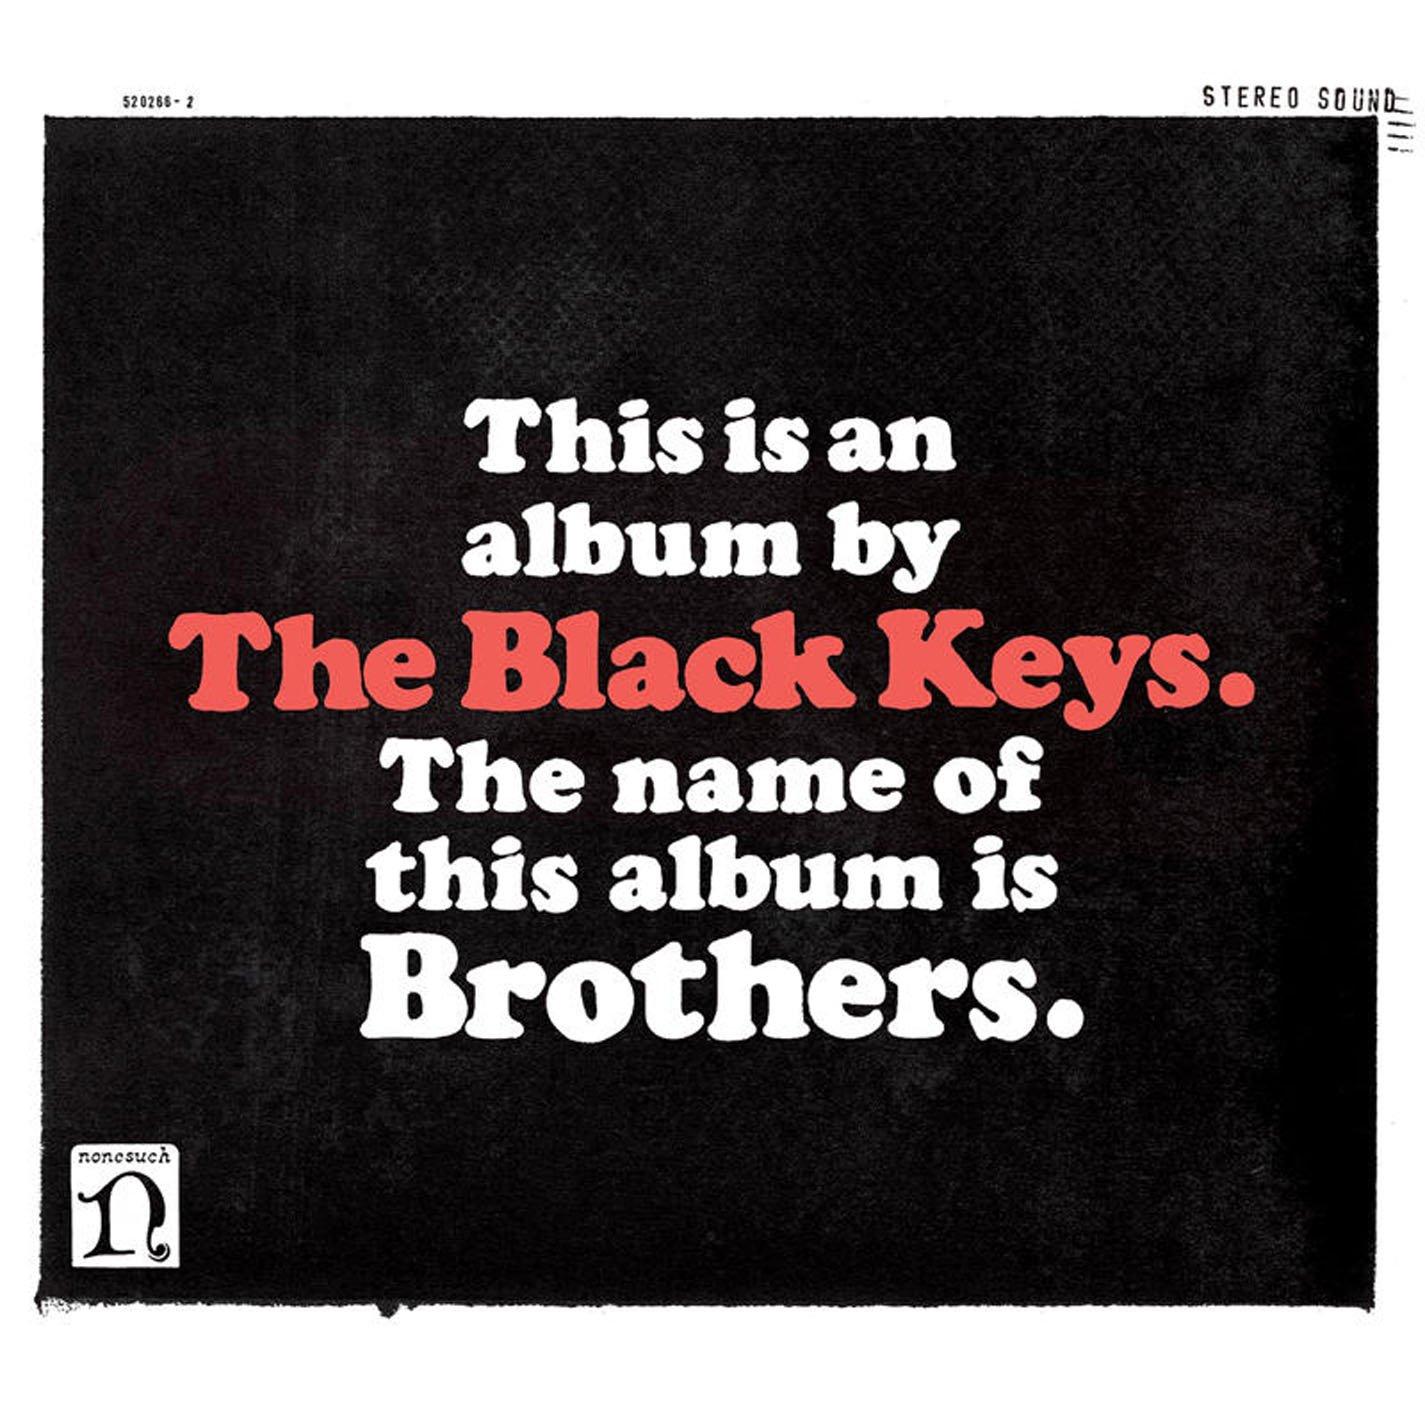 Black keys t shirt uk - Black Keys T Shirt Uk 49